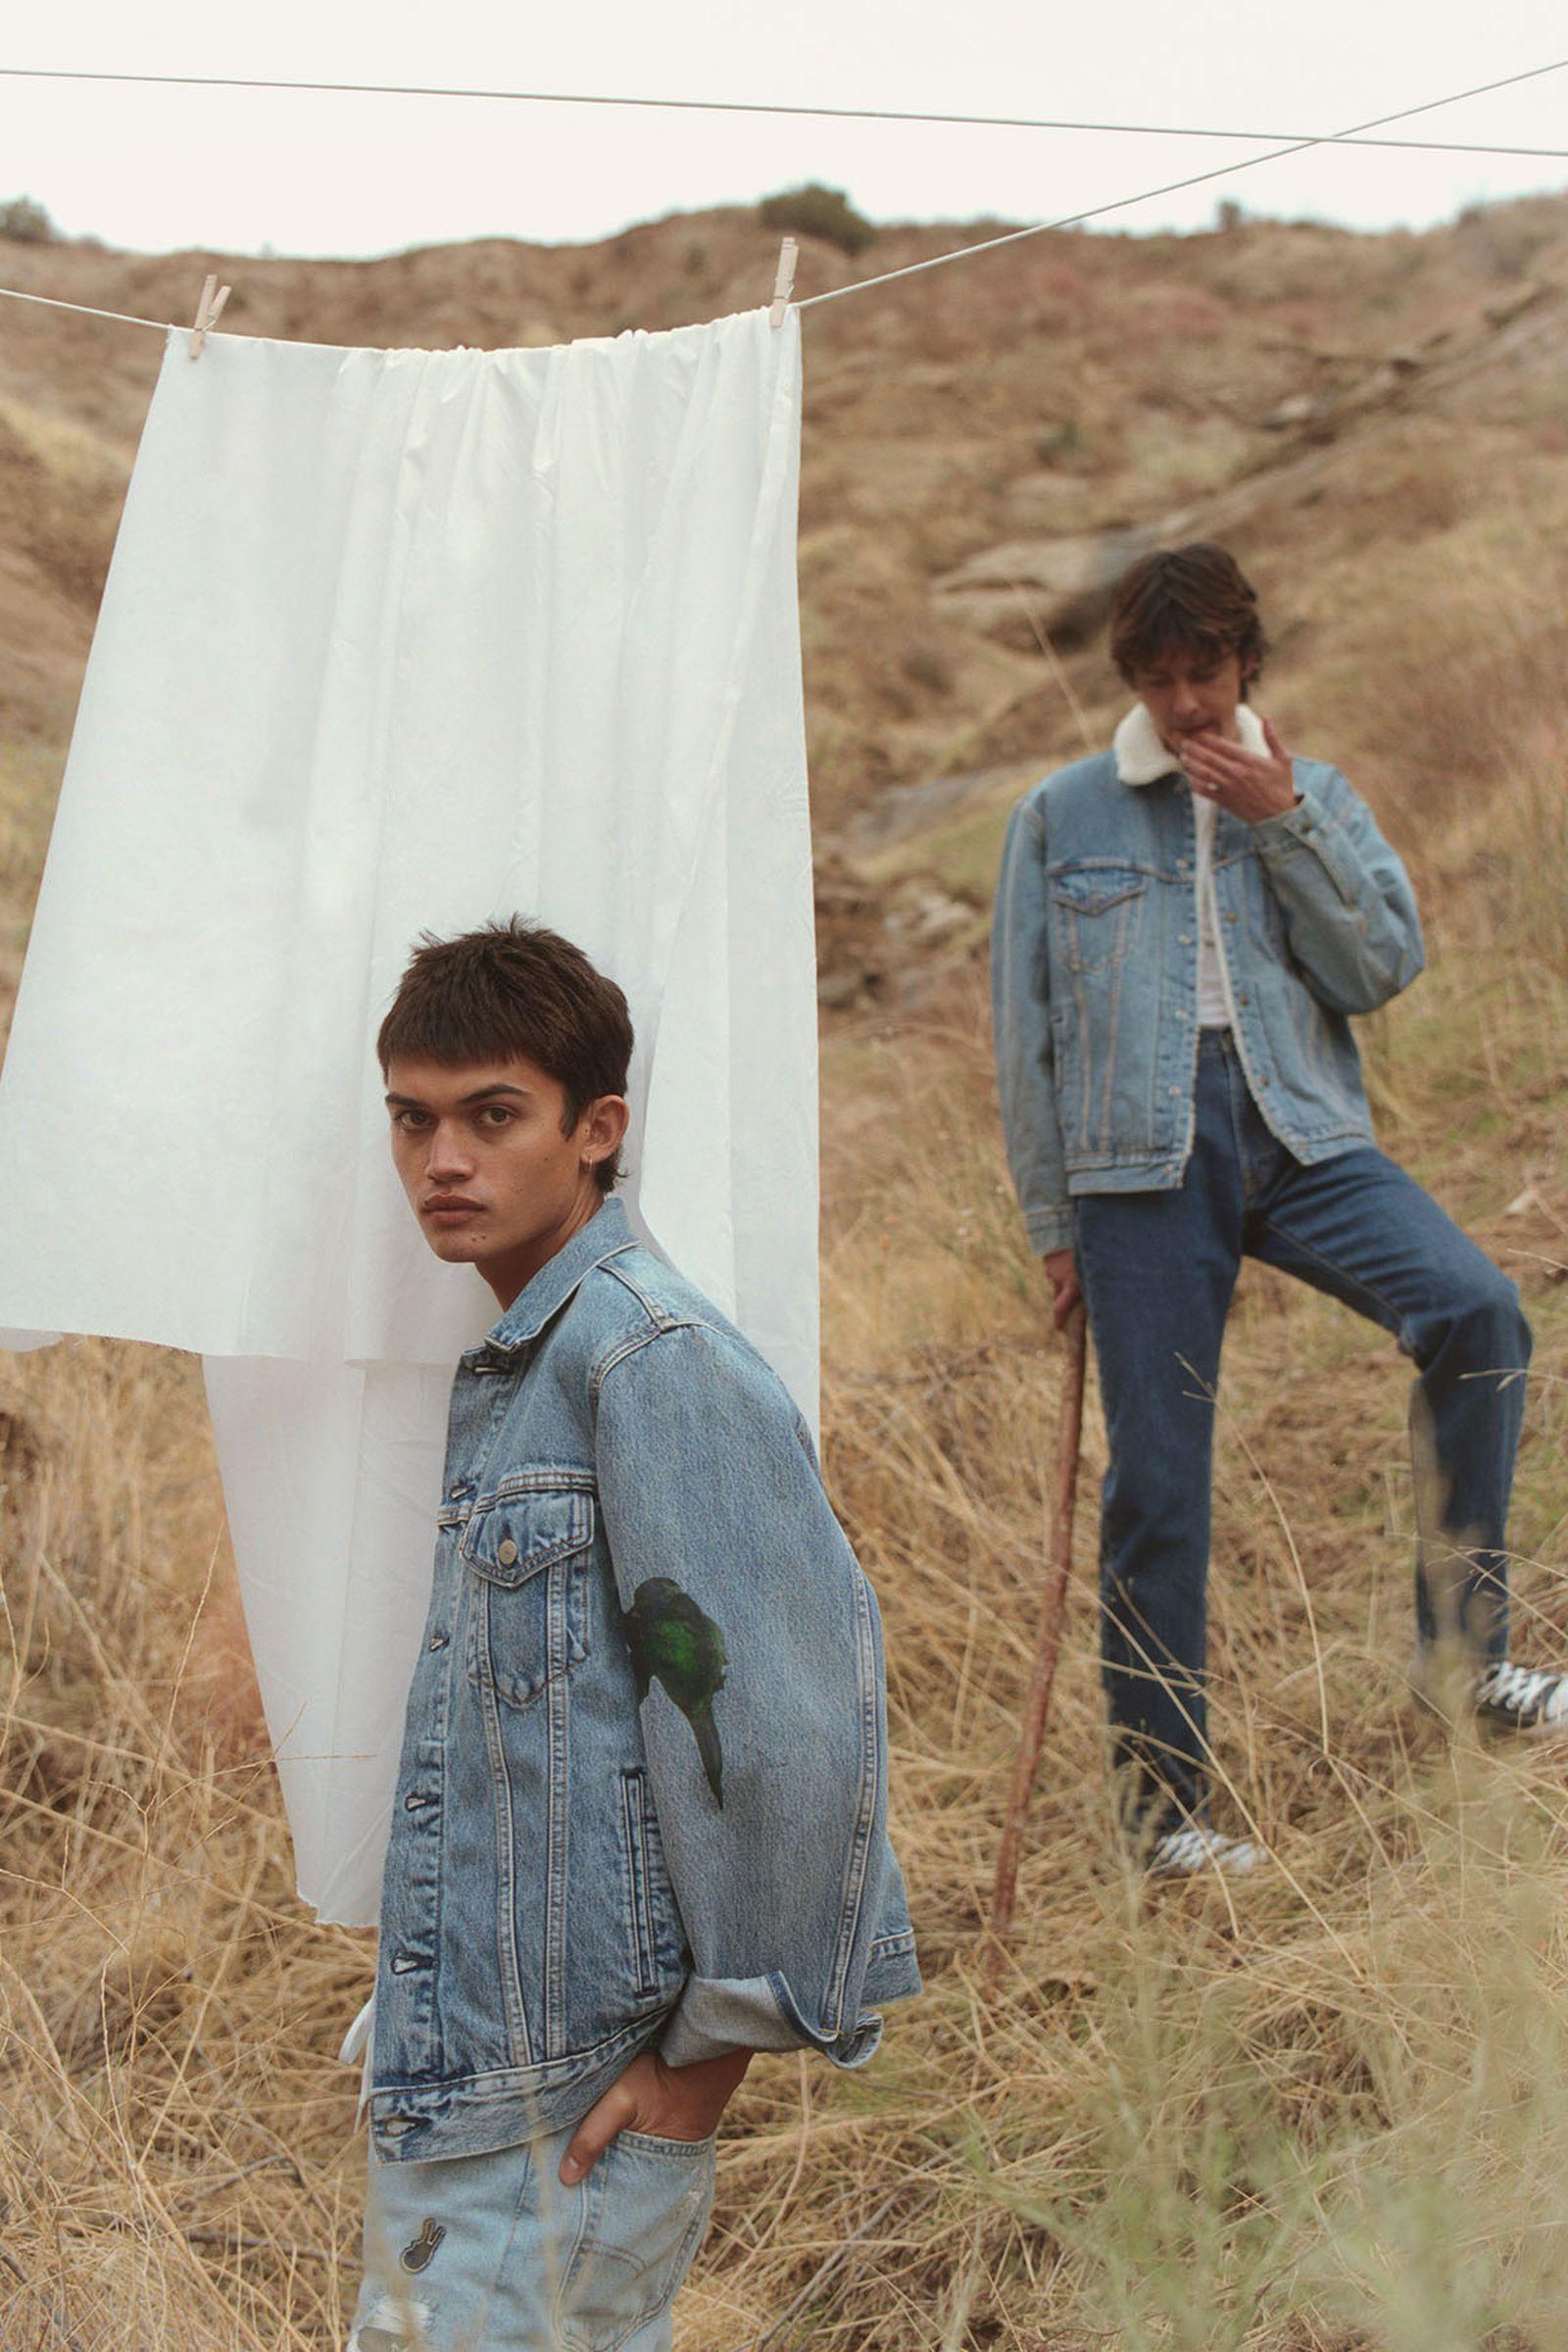 Left: 551™ Z Authentic Straight Jeans in Phantom Right: 551™ Z Authentic Straight Jeans in Rubber Worm